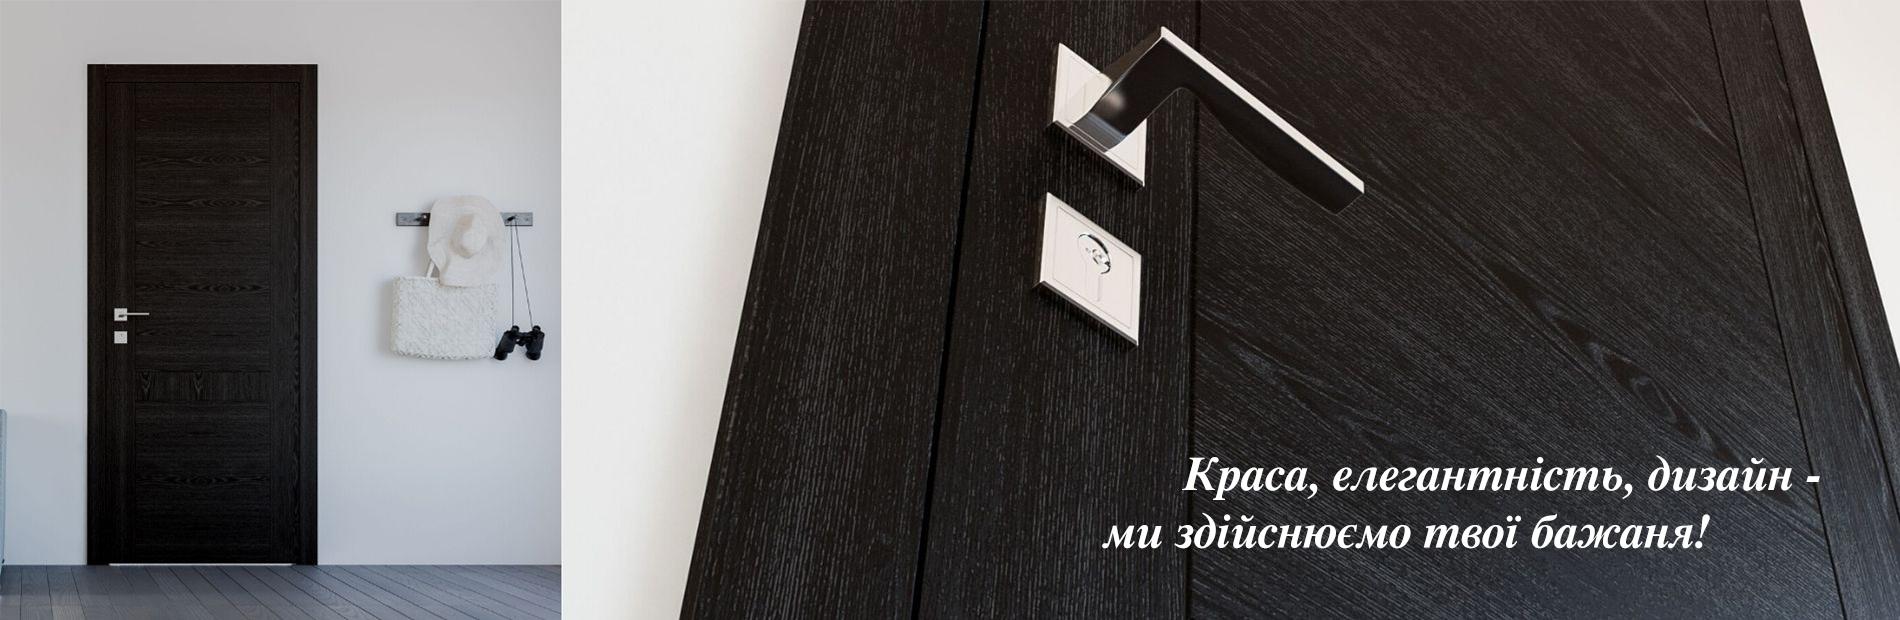 міжкімнатні двері в спальню вітальню кухню